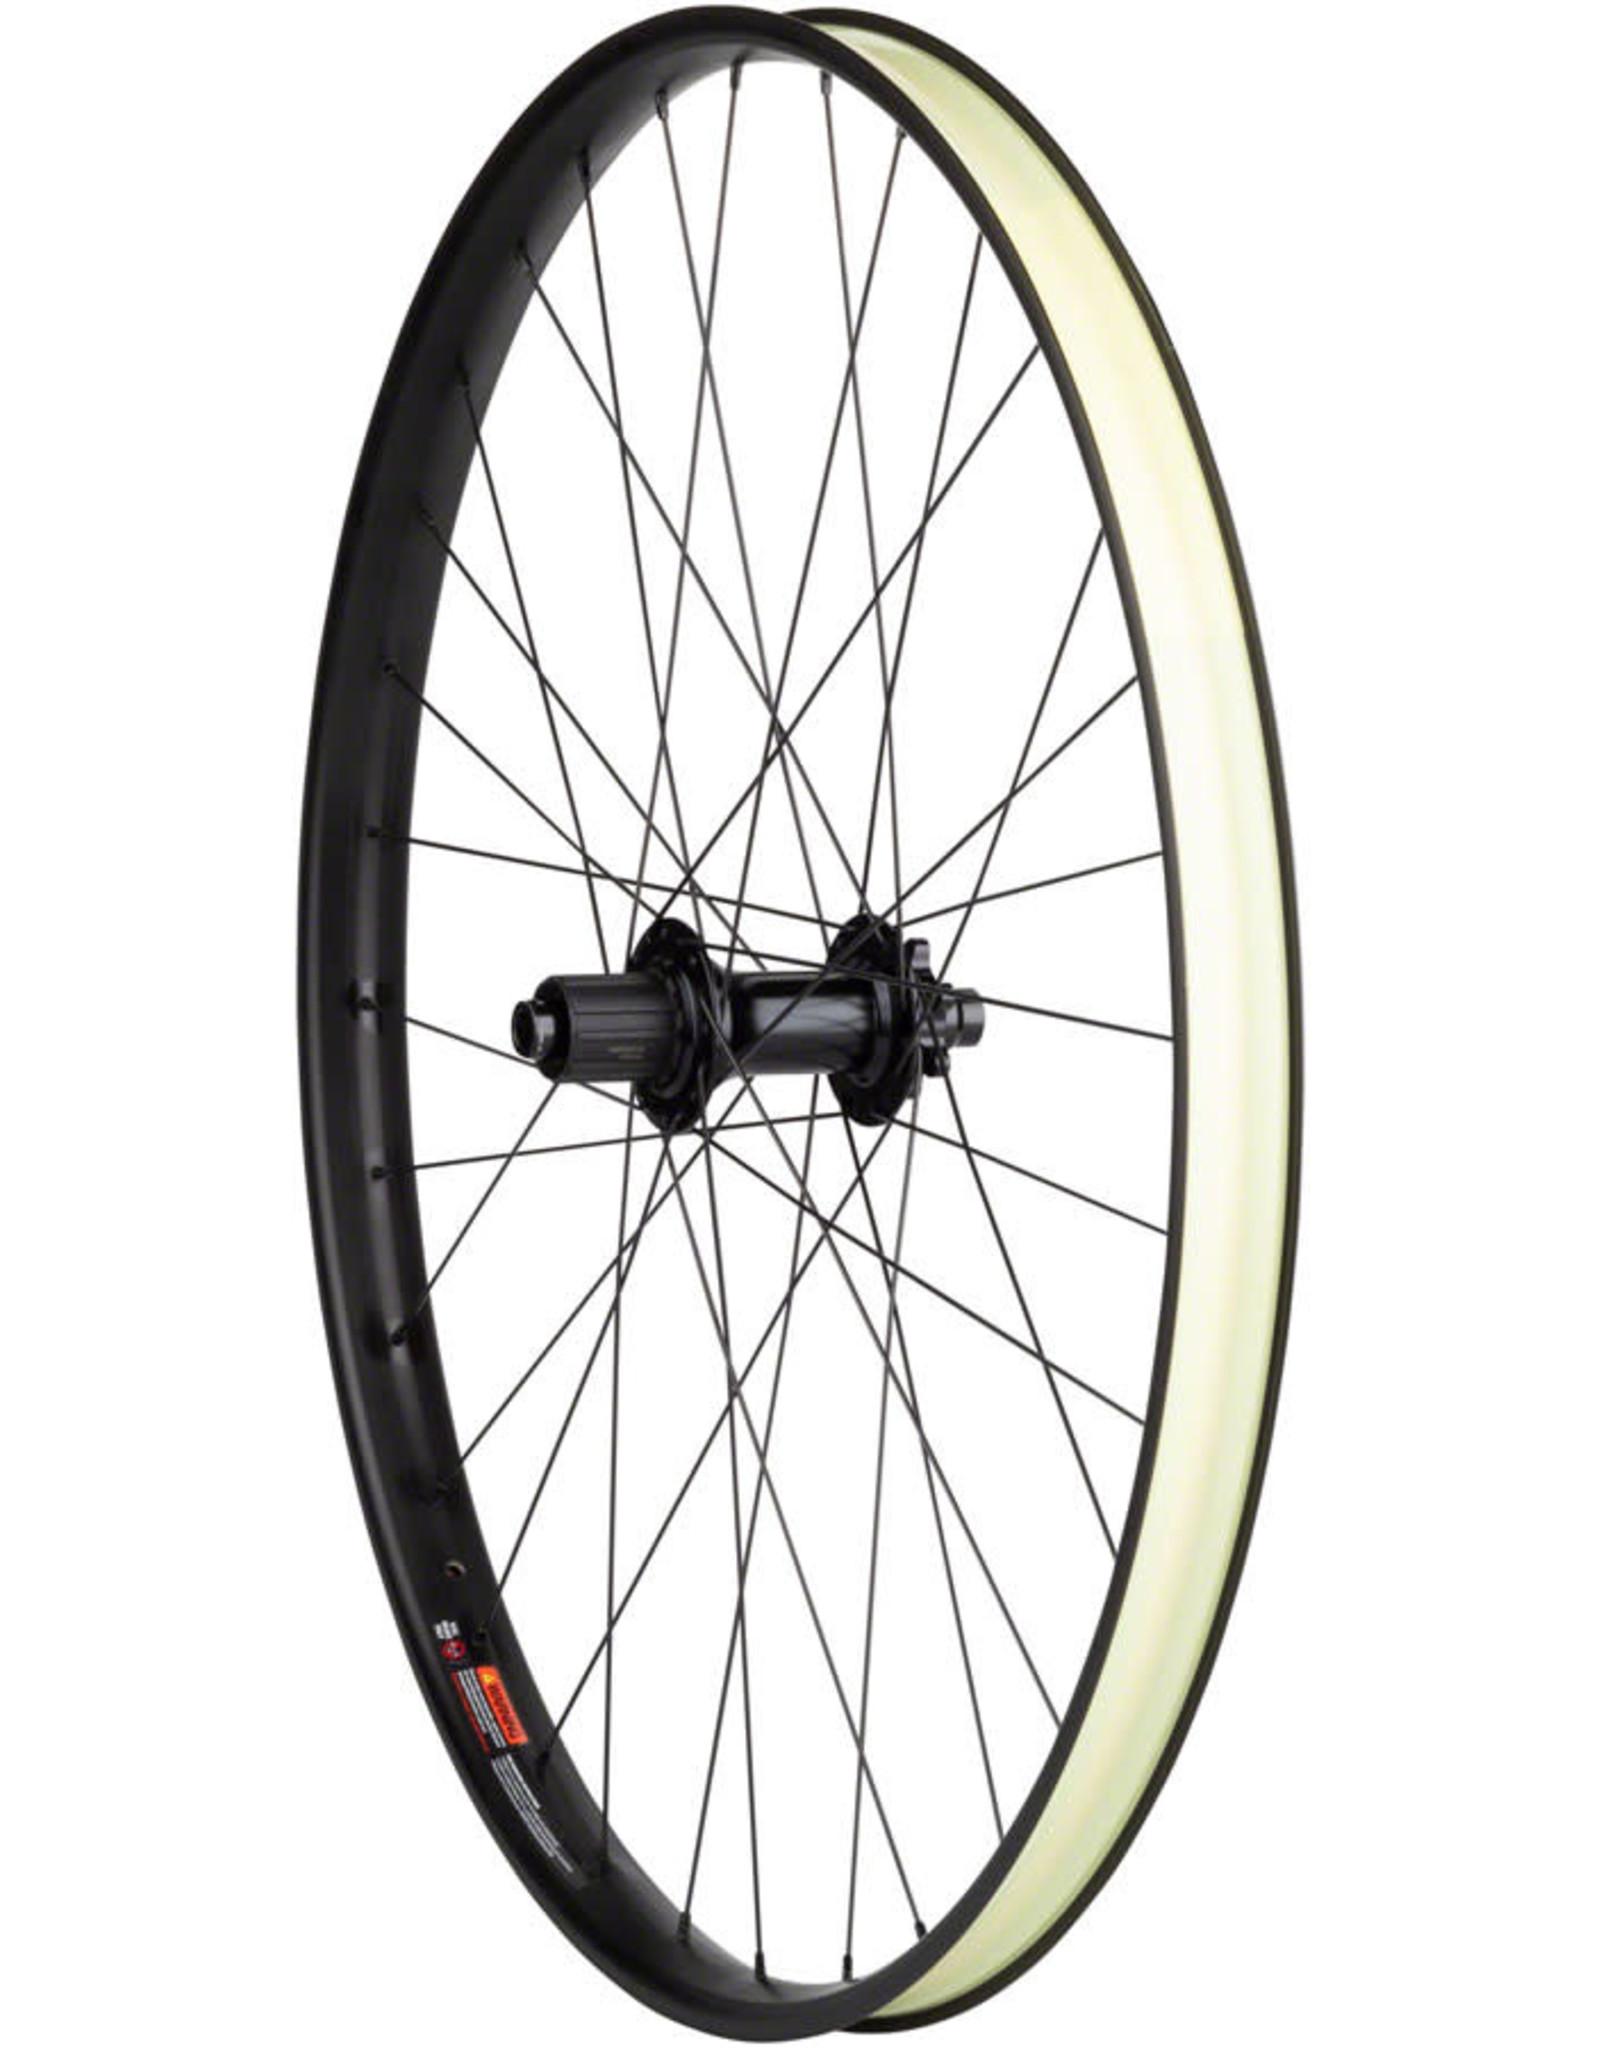 "Quality Wheels Quality Wheels WTB i35 Disc Rear Wheel - 29"", 12 x 157mm, 6-Bolt, HG 10, Black"